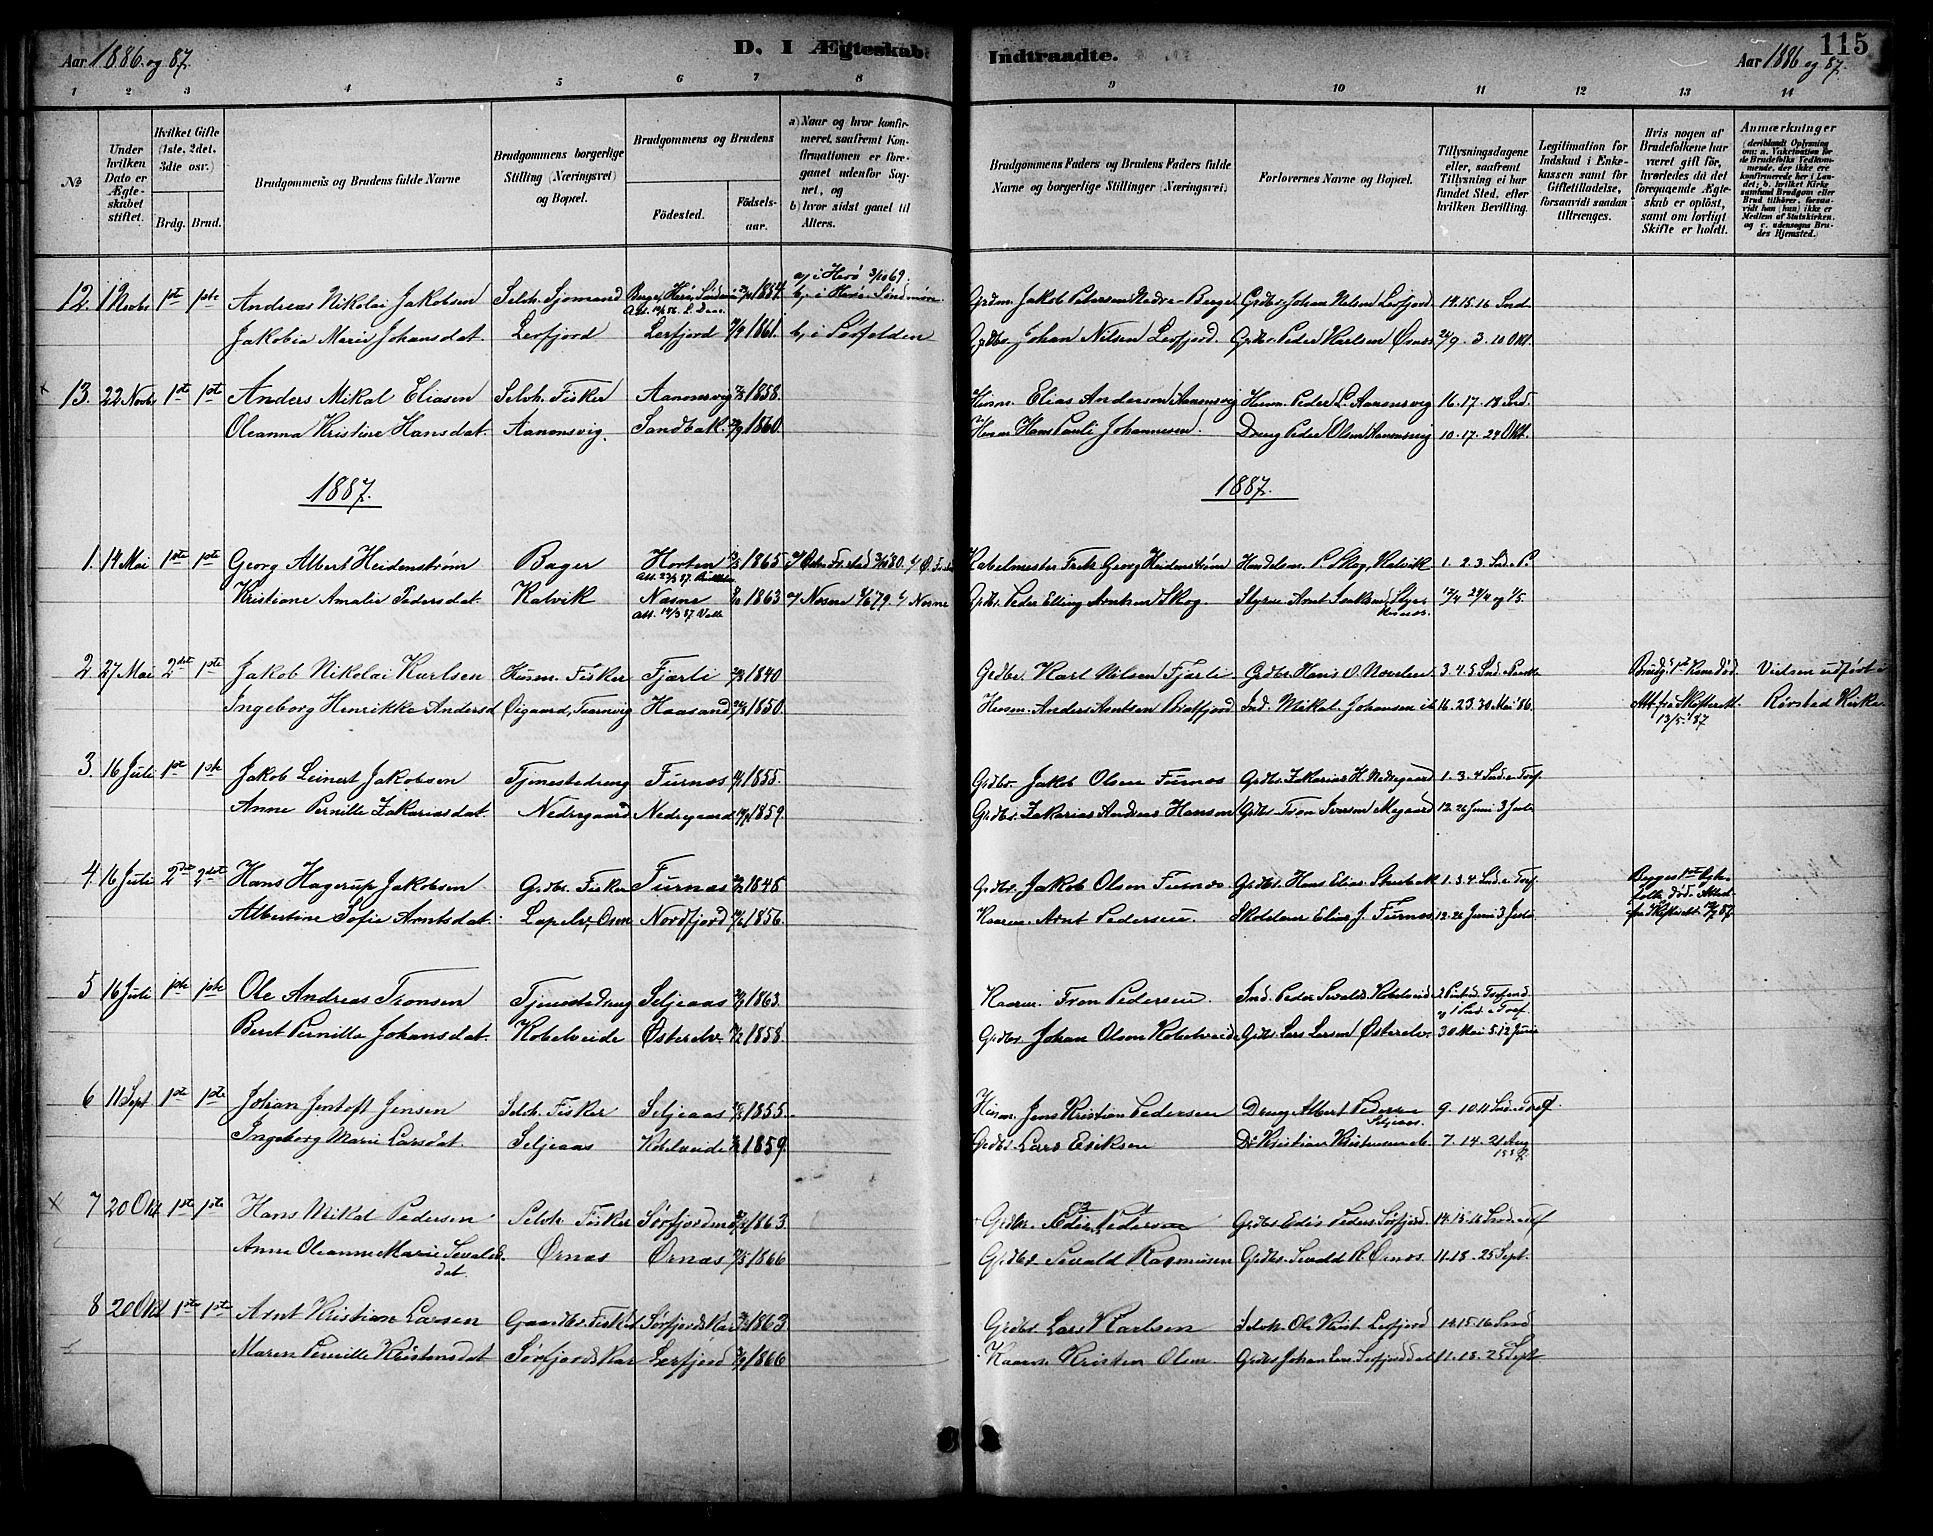 SAT, Ministerialprotokoller, klokkerbøker og fødselsregistre - Nordland, 854/L0777: Ministerialbok nr. 854A01 /1, 1883-1891, s. 115